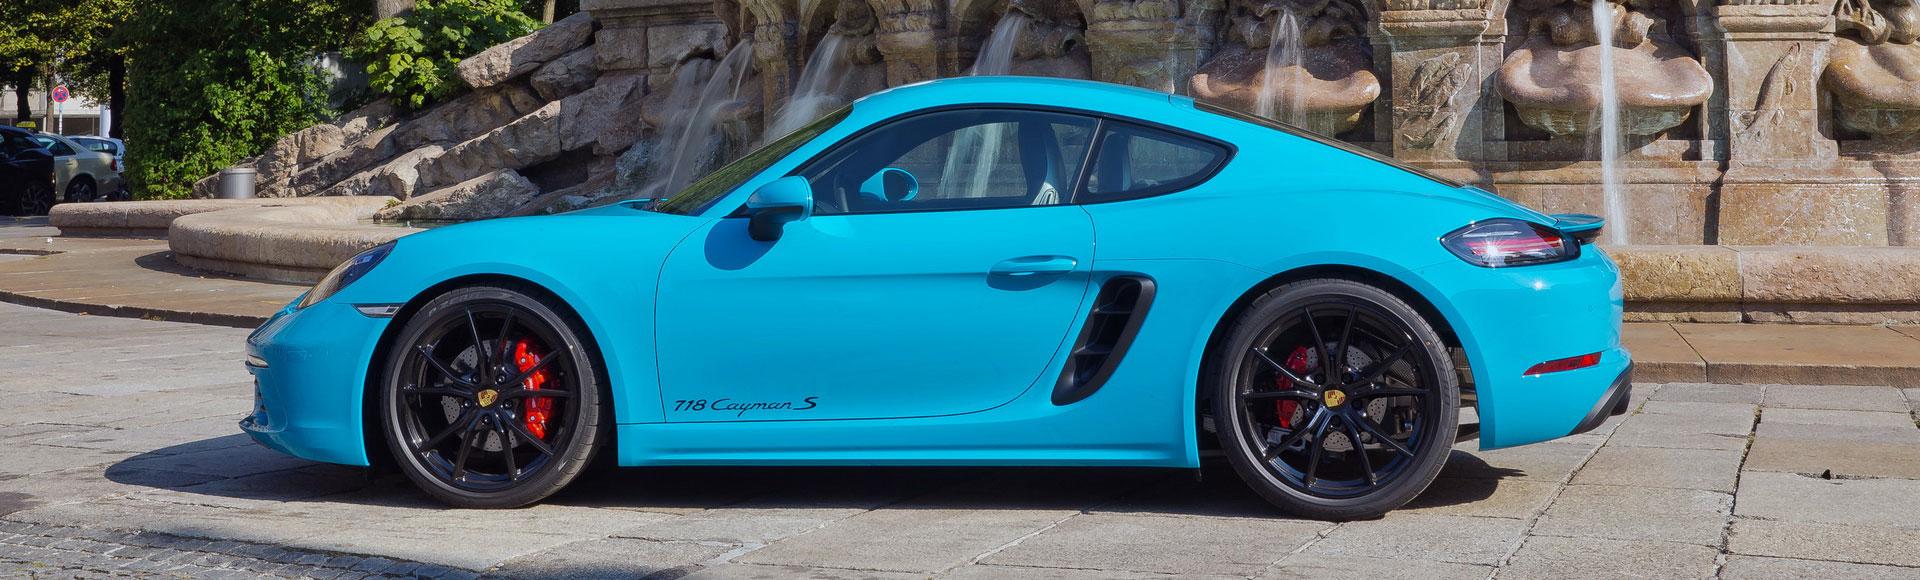 Porsche 718 Cayman 2016 021 Sommer